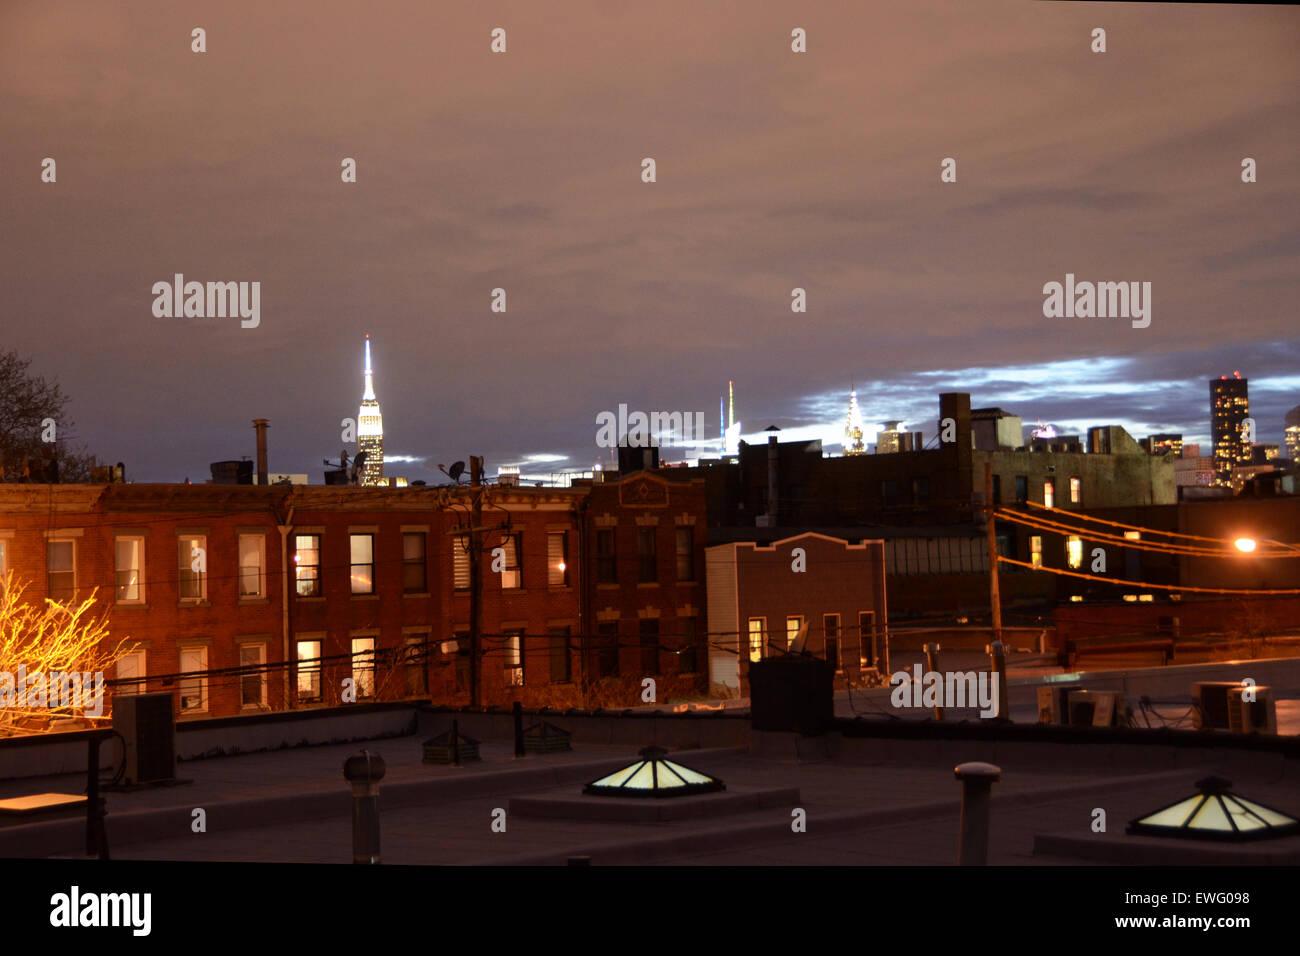 manhattan skyline night chrysler building empire state building dusk from brooklyn houses - Stock Image